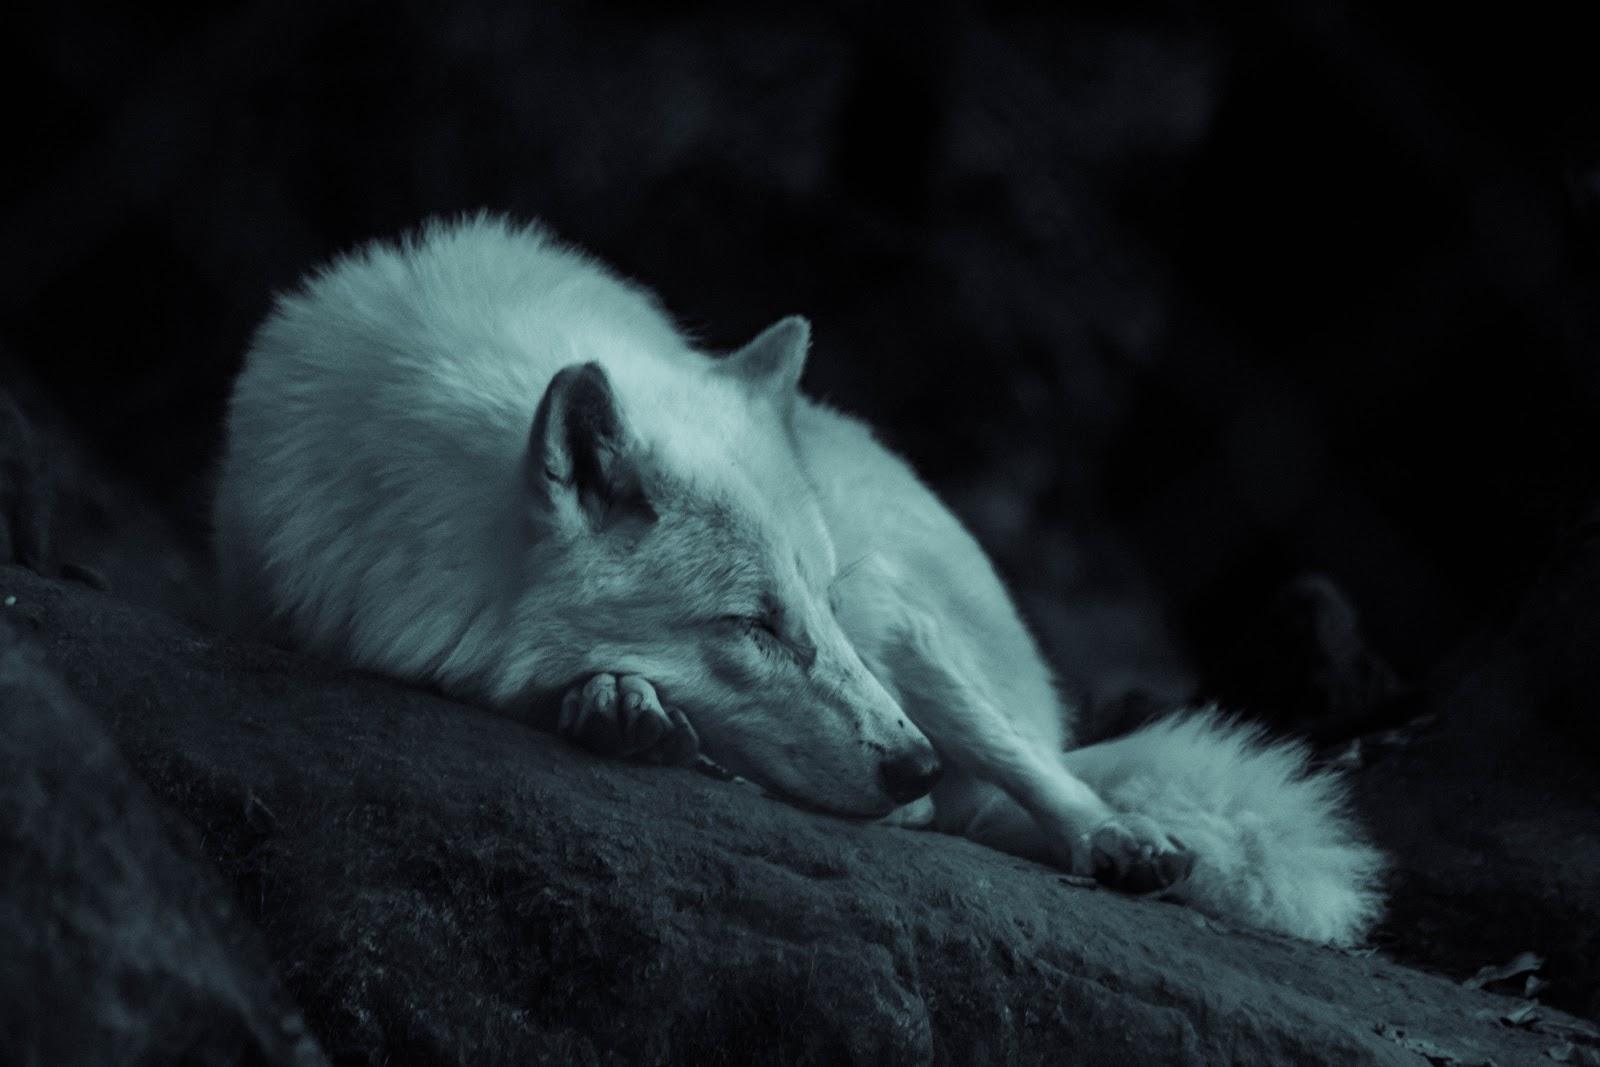 Dark image of a white fox sleeping